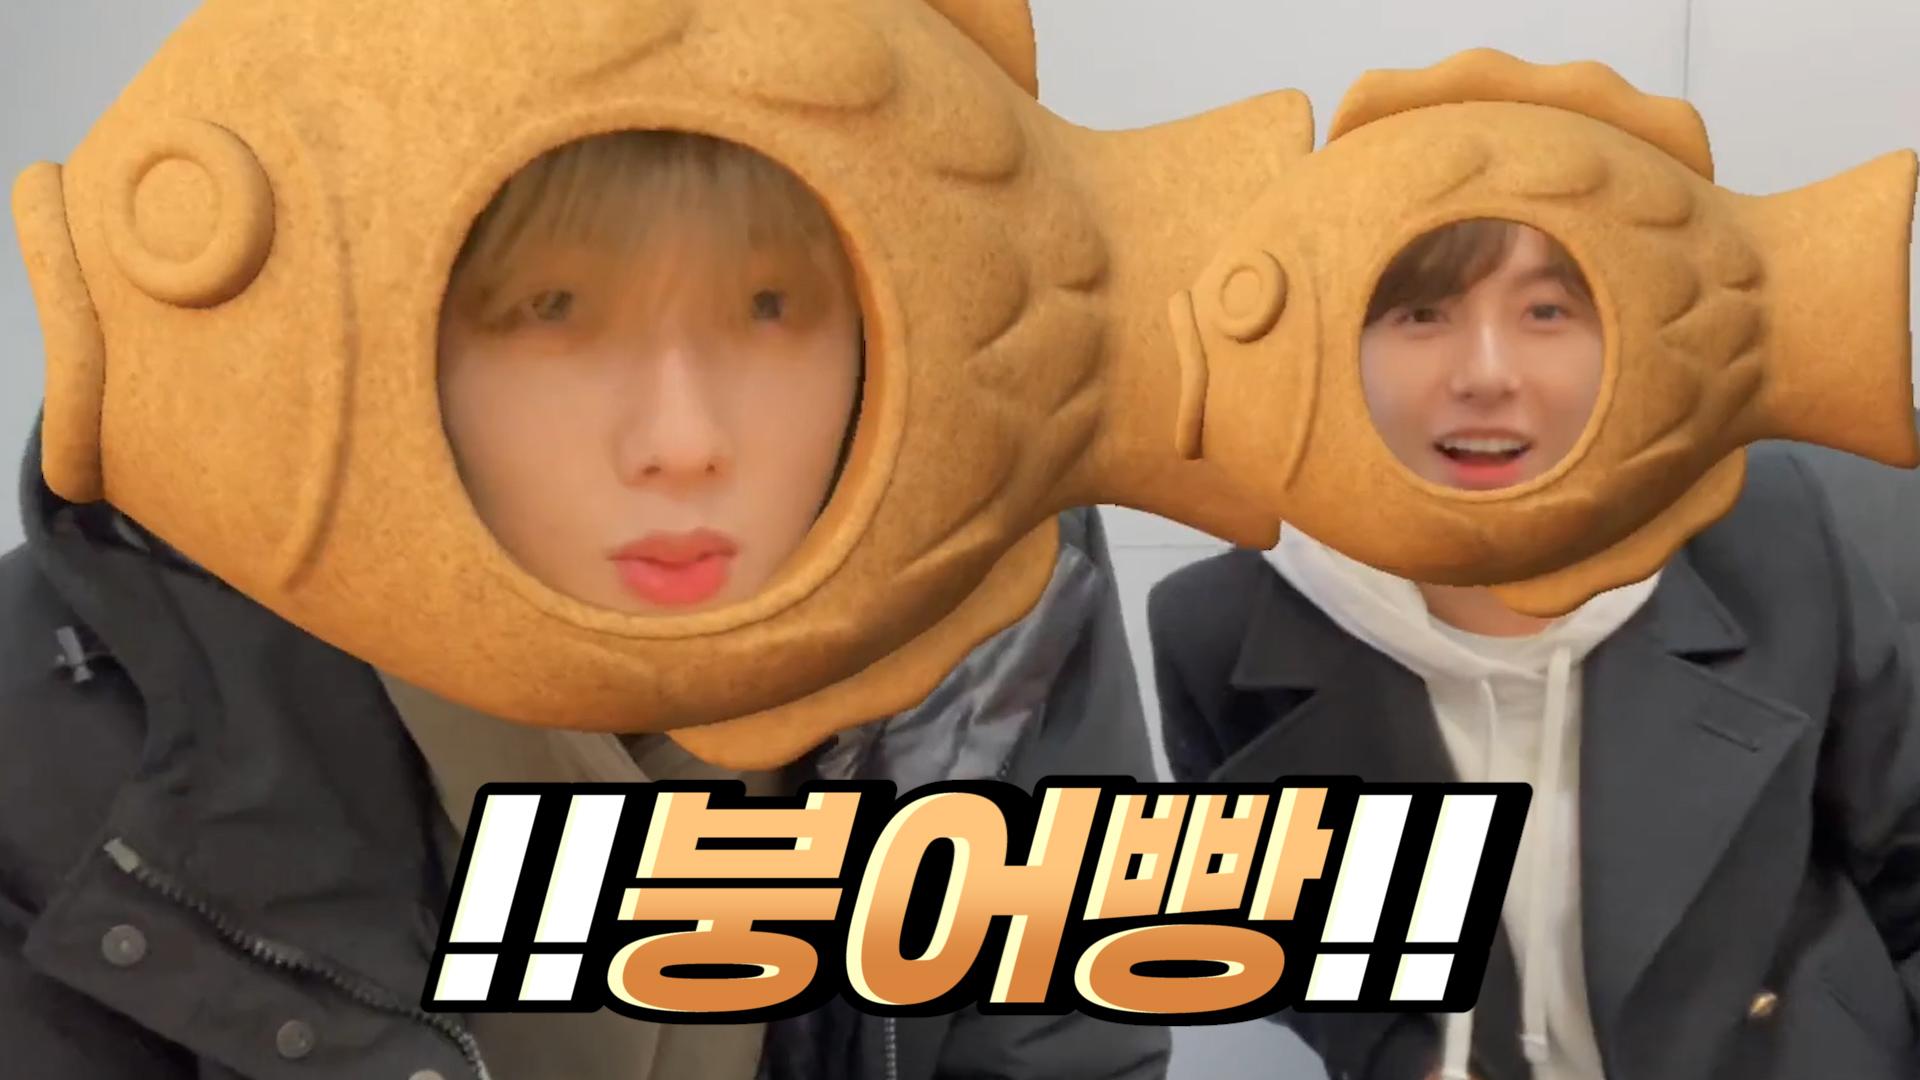 [NCT] 꼭 붕어빵 짱이 돼서 맨날 드림이들 붕어빵 구워줘버릴 거야 (Jisung&Renjun talking about their recent days)